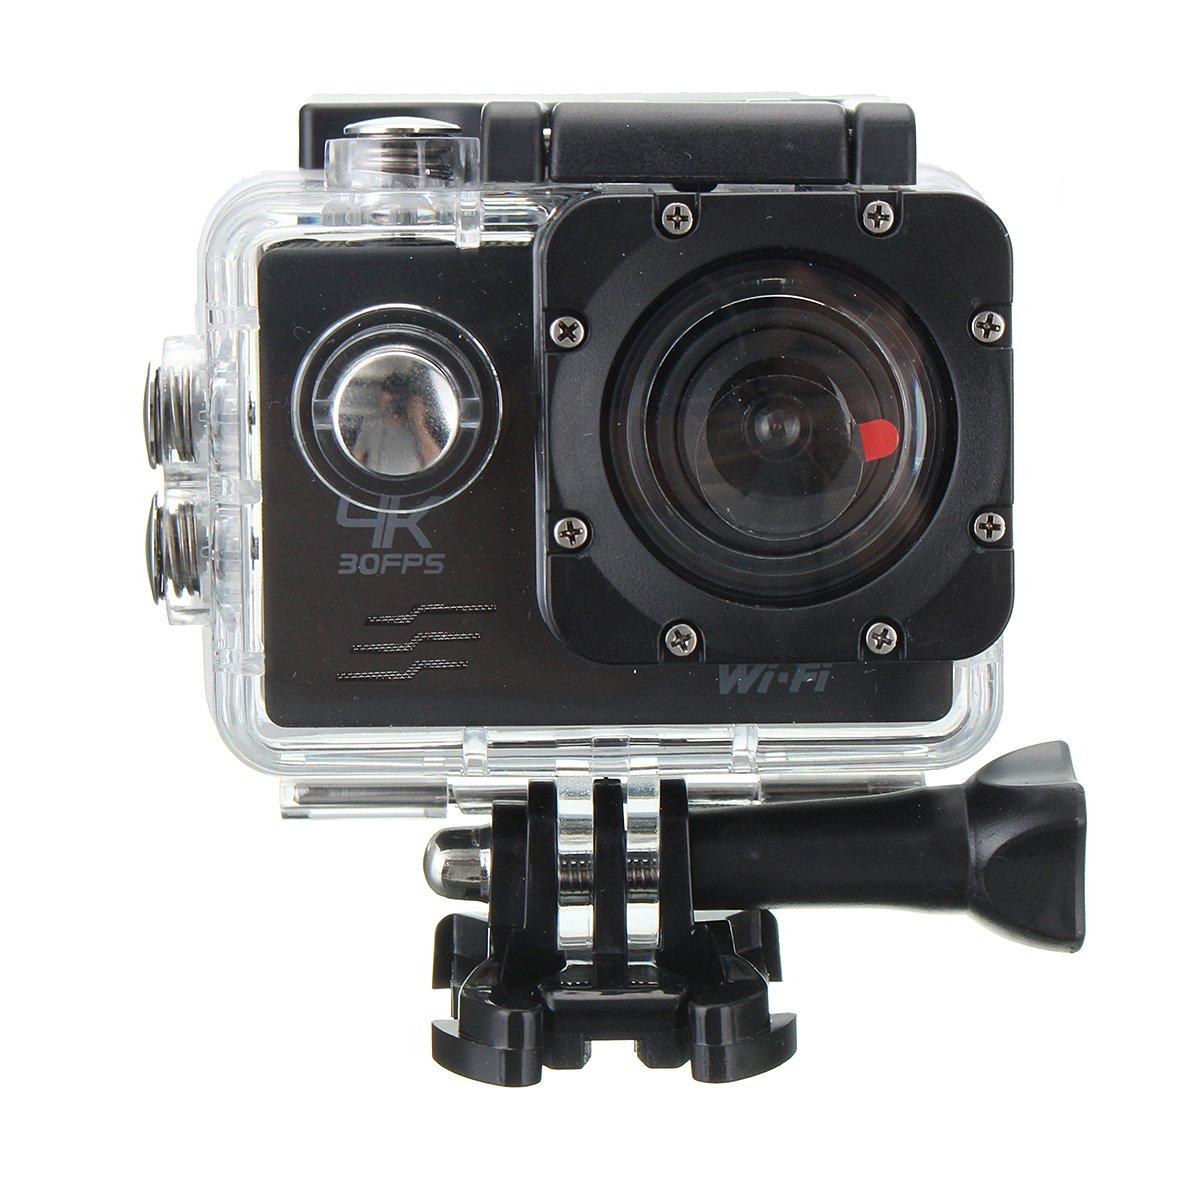 4k sj8000r 1080p ultra 2.0 inch wifi sport dv action camera B07F5YPDRG